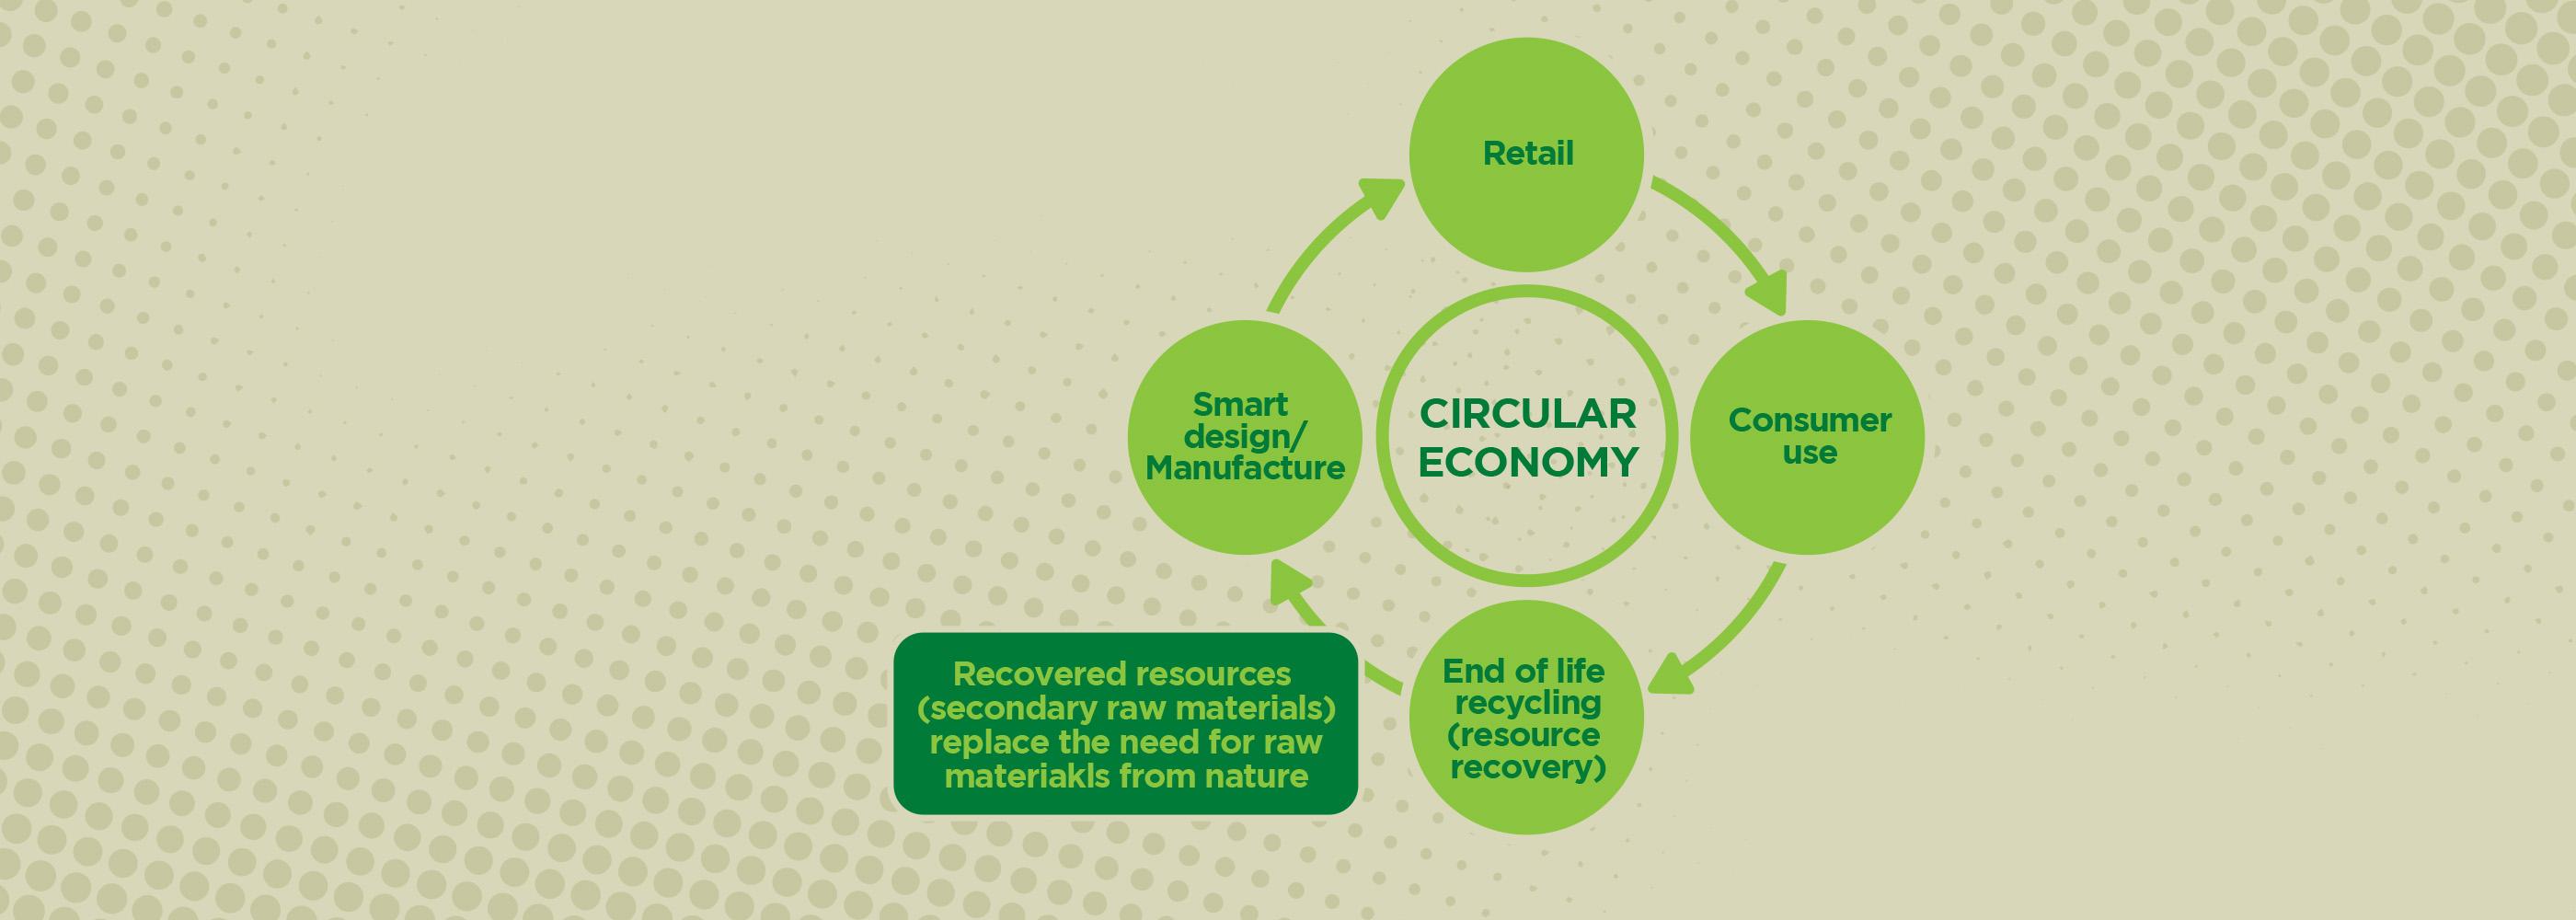 NAWMA Circular Economy